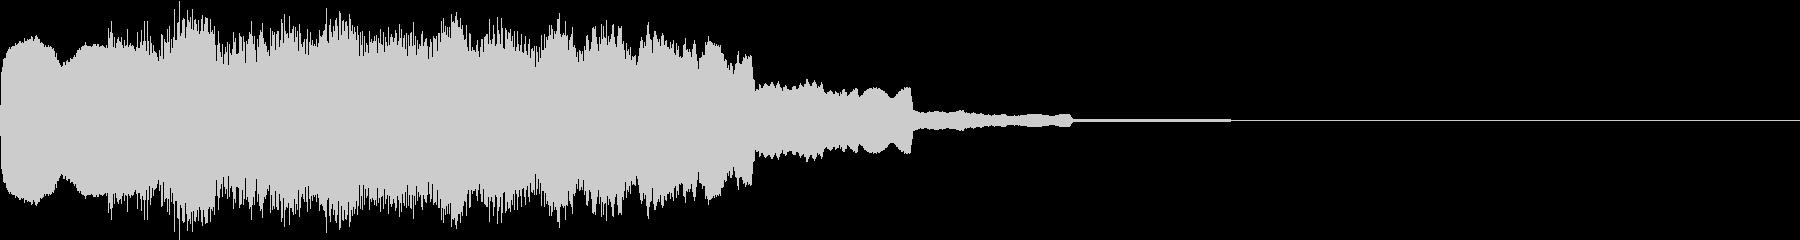 DOREMI ドレミ音階 キラキラFX2の未再生の波形